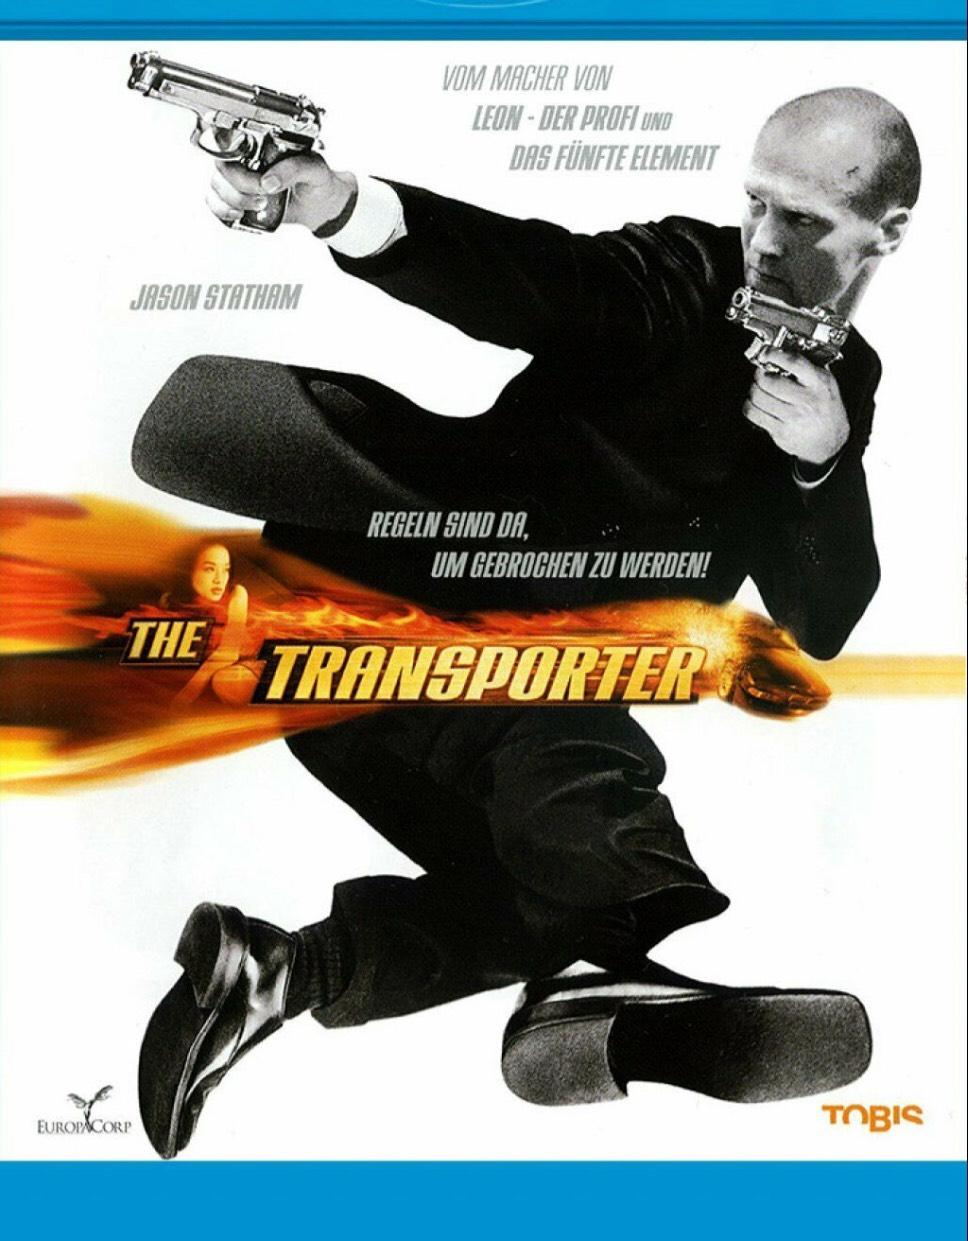 [dodax.de/ebay-dodax] The Transporter mit J. Statham (Blu-ray)